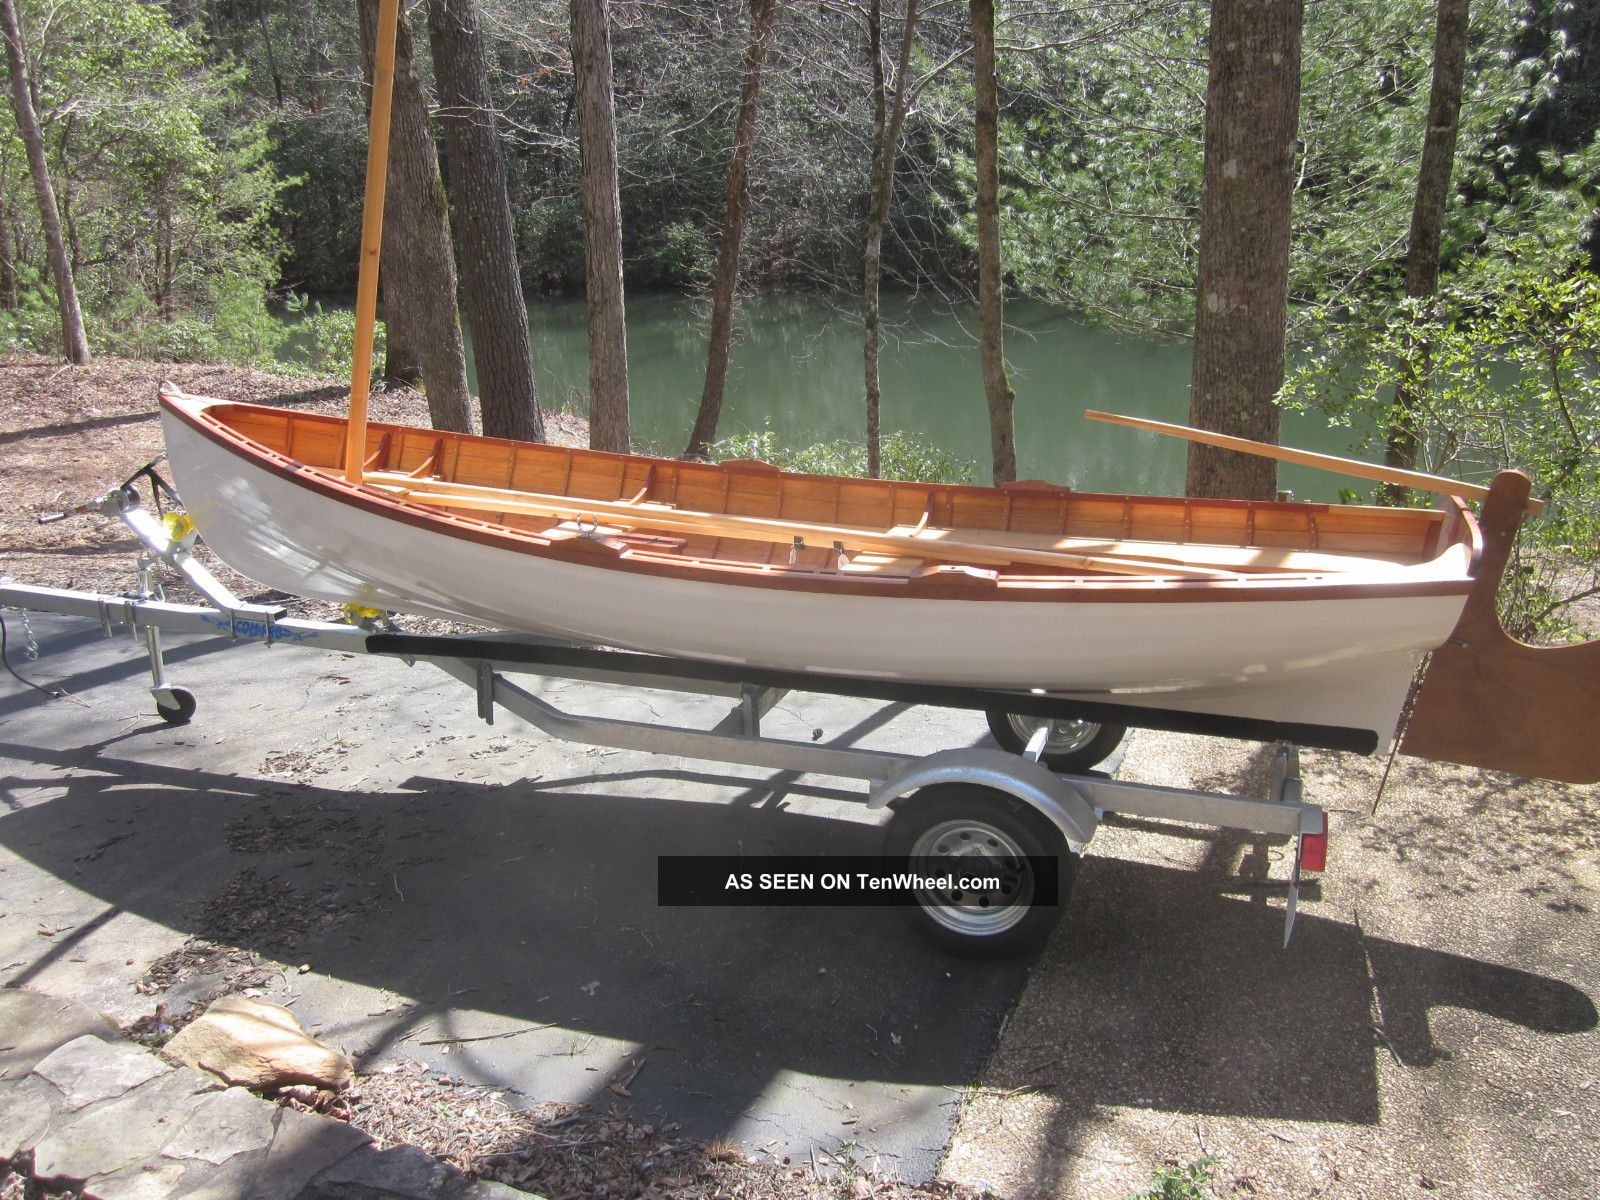 2012 Whitehall Design 14 ' Sailboats Under 20 feet photo